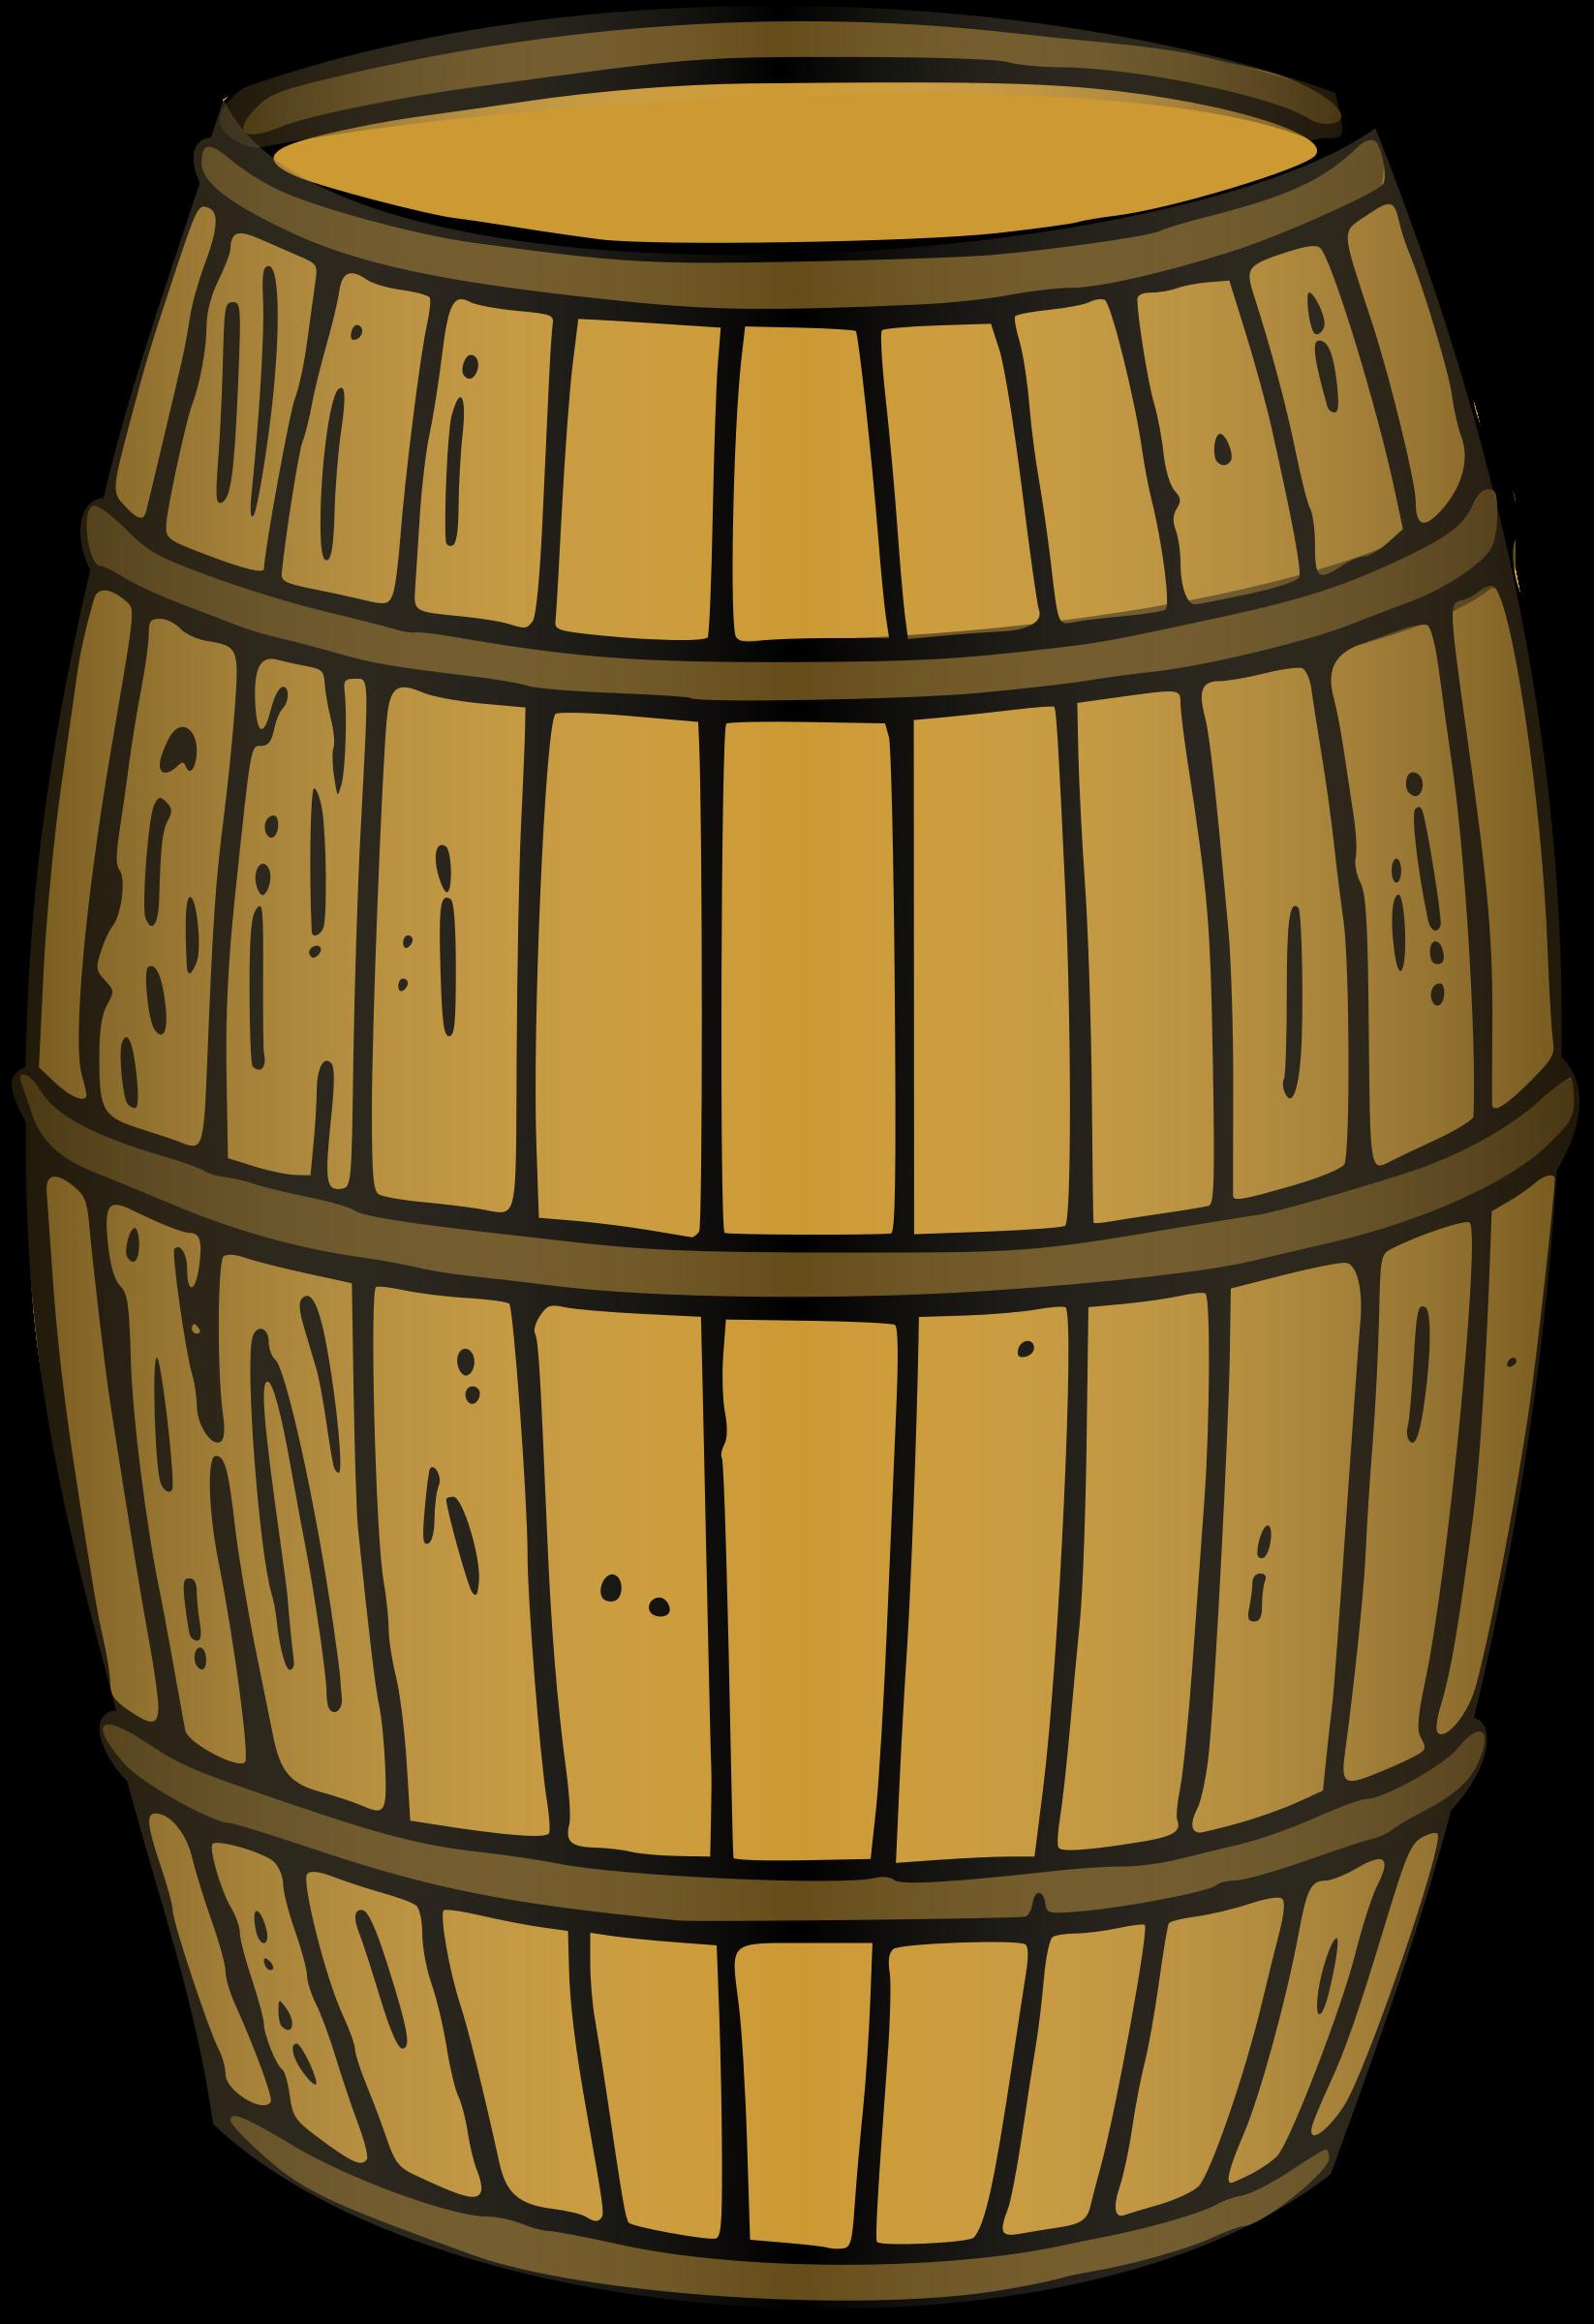 Barrel Rendered Clip Art Barrel Kegs